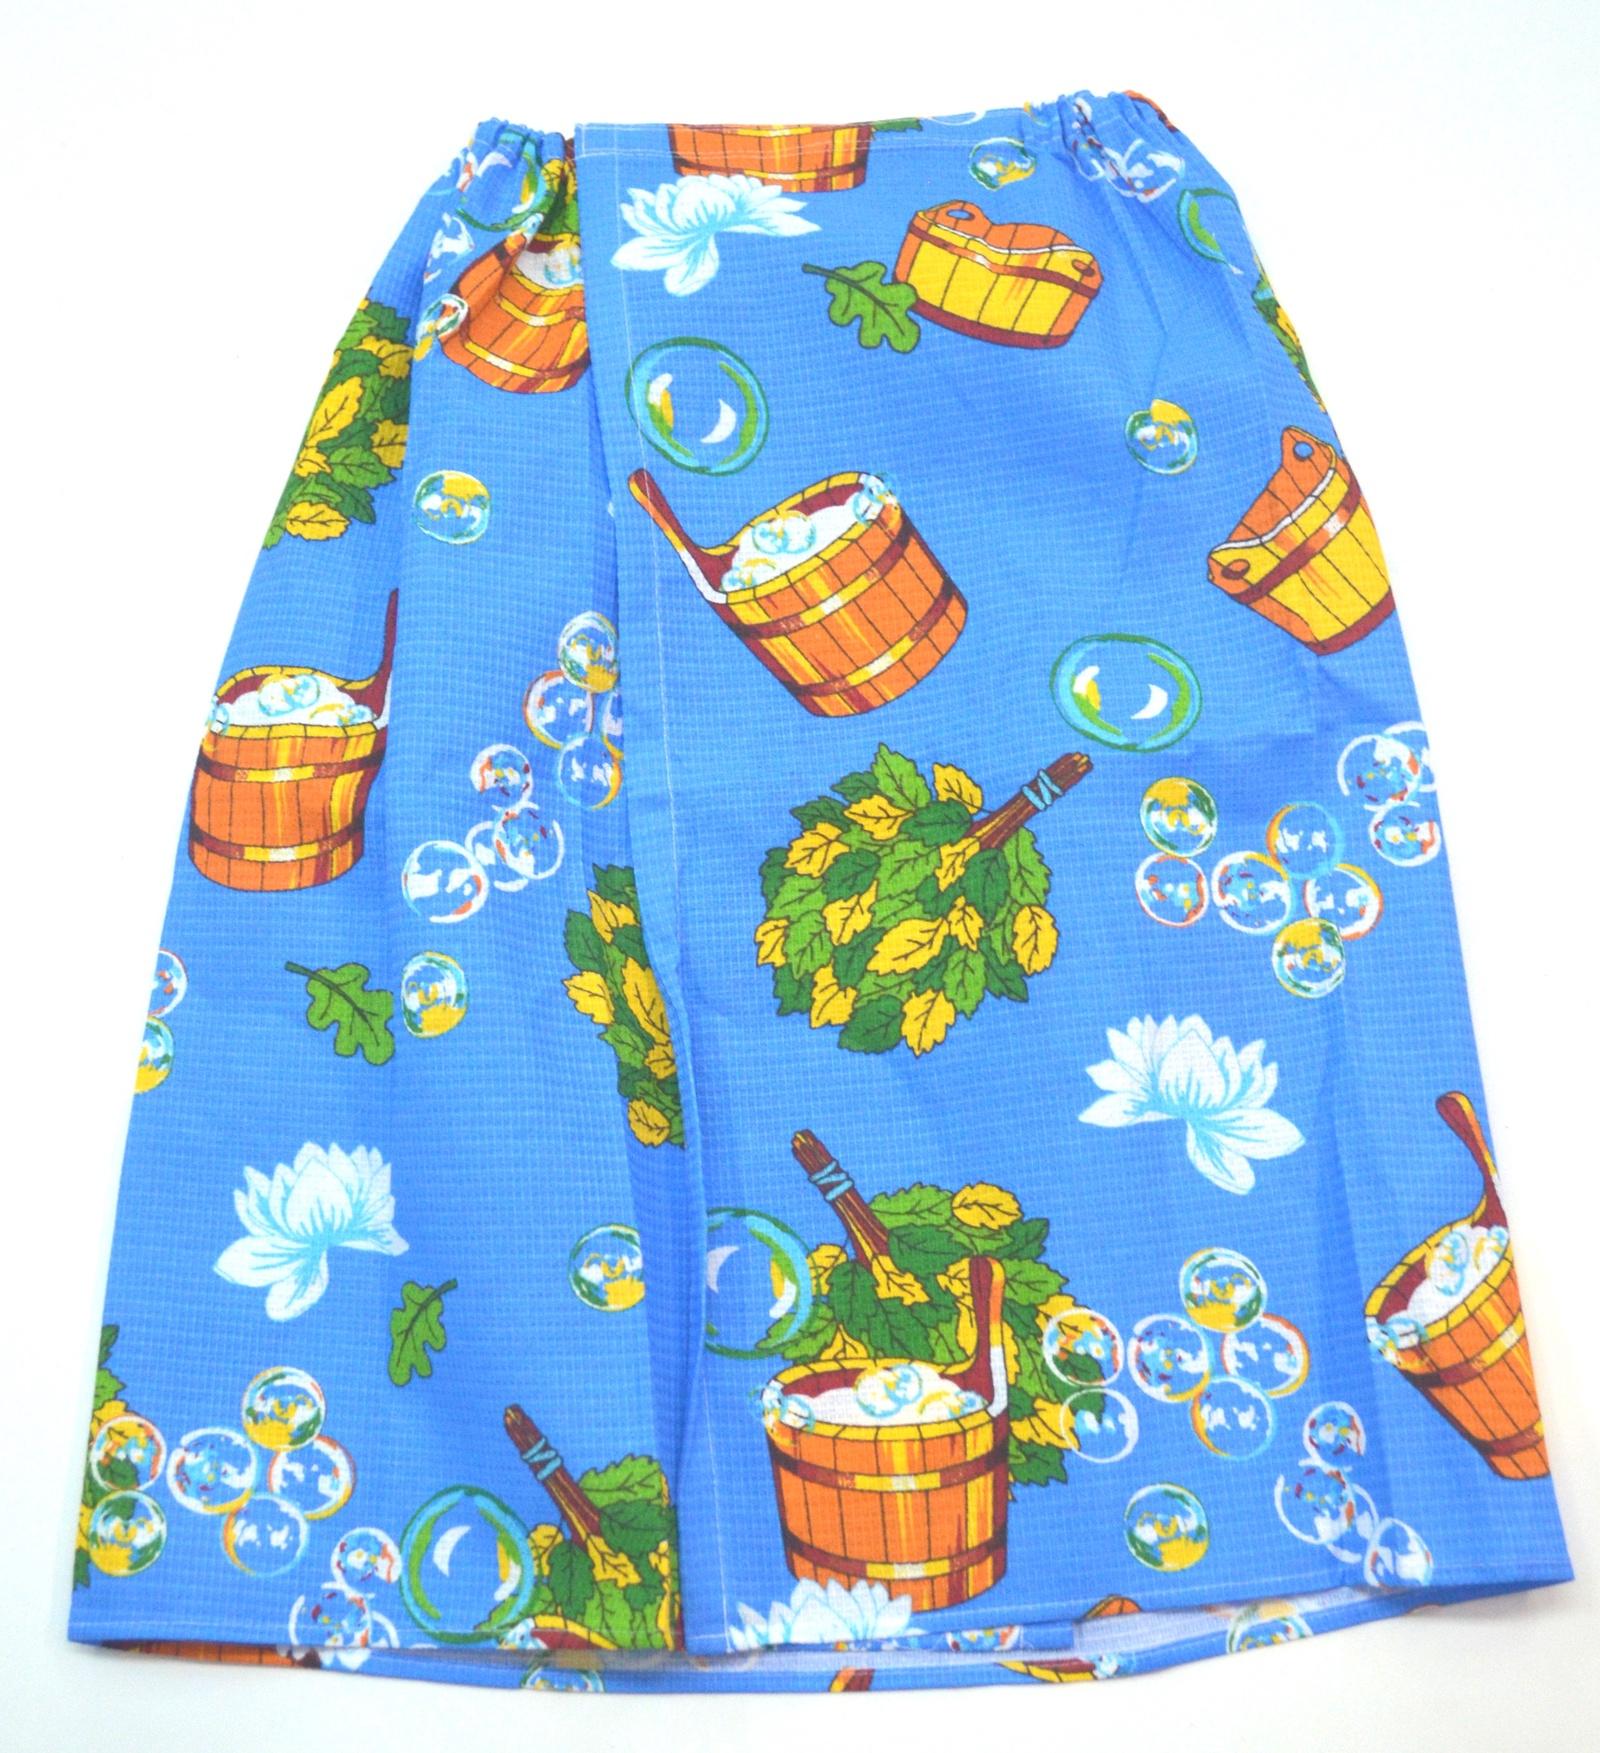 Килт для бани мужской вафельная ткань Баня синяя килт для бани tapani тапани